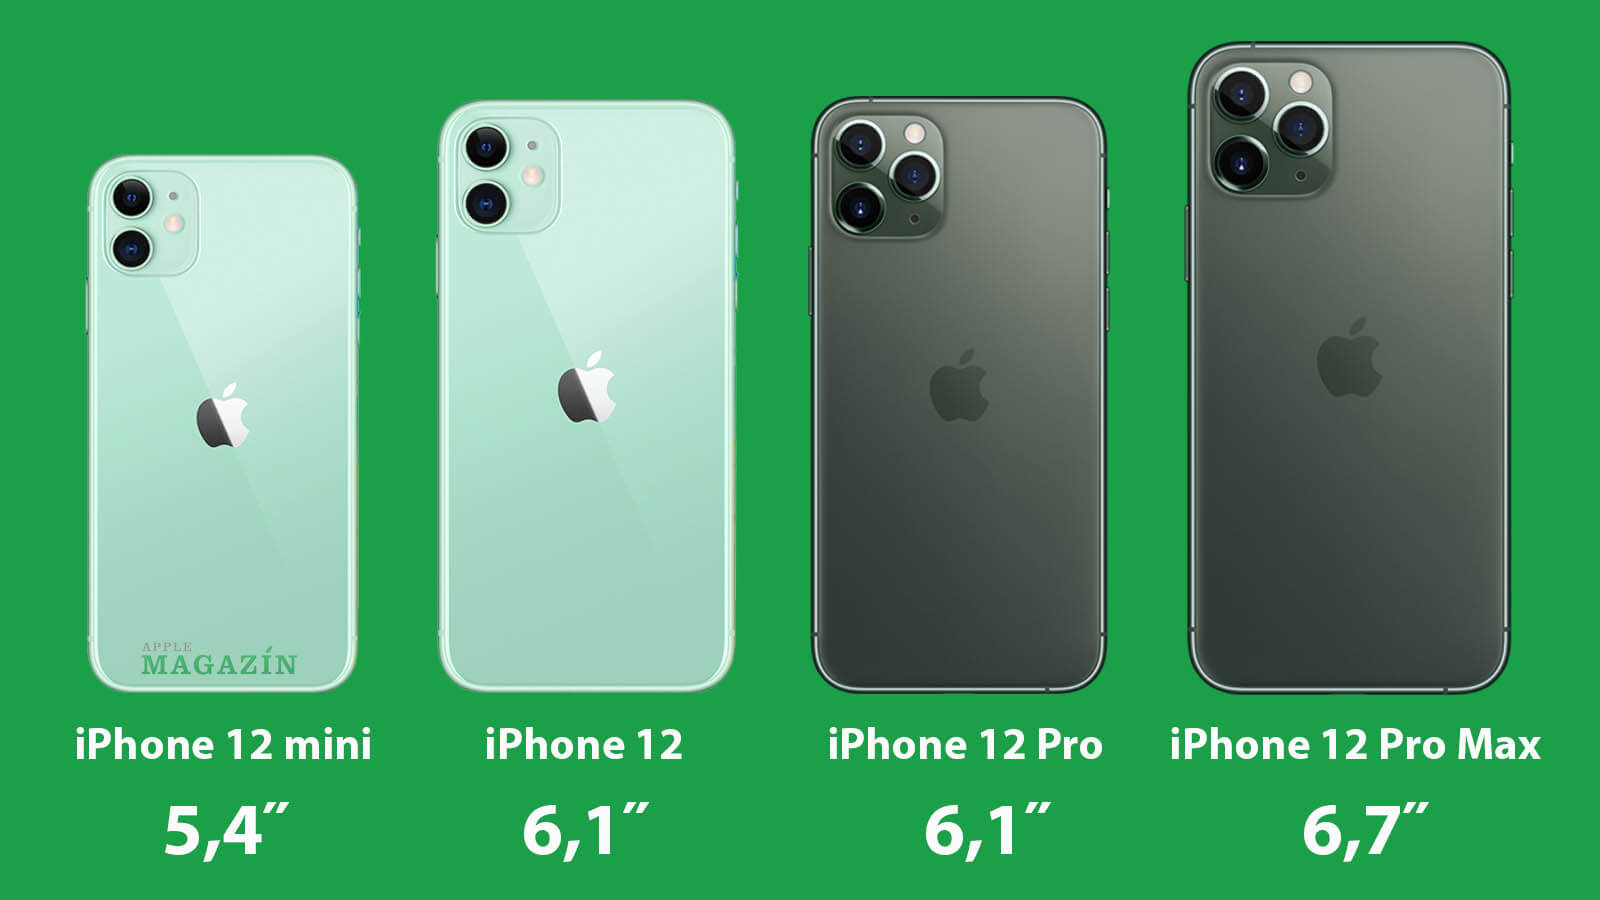 vzhled nového iphone 12, 12 pro, 12 mini a 12 max